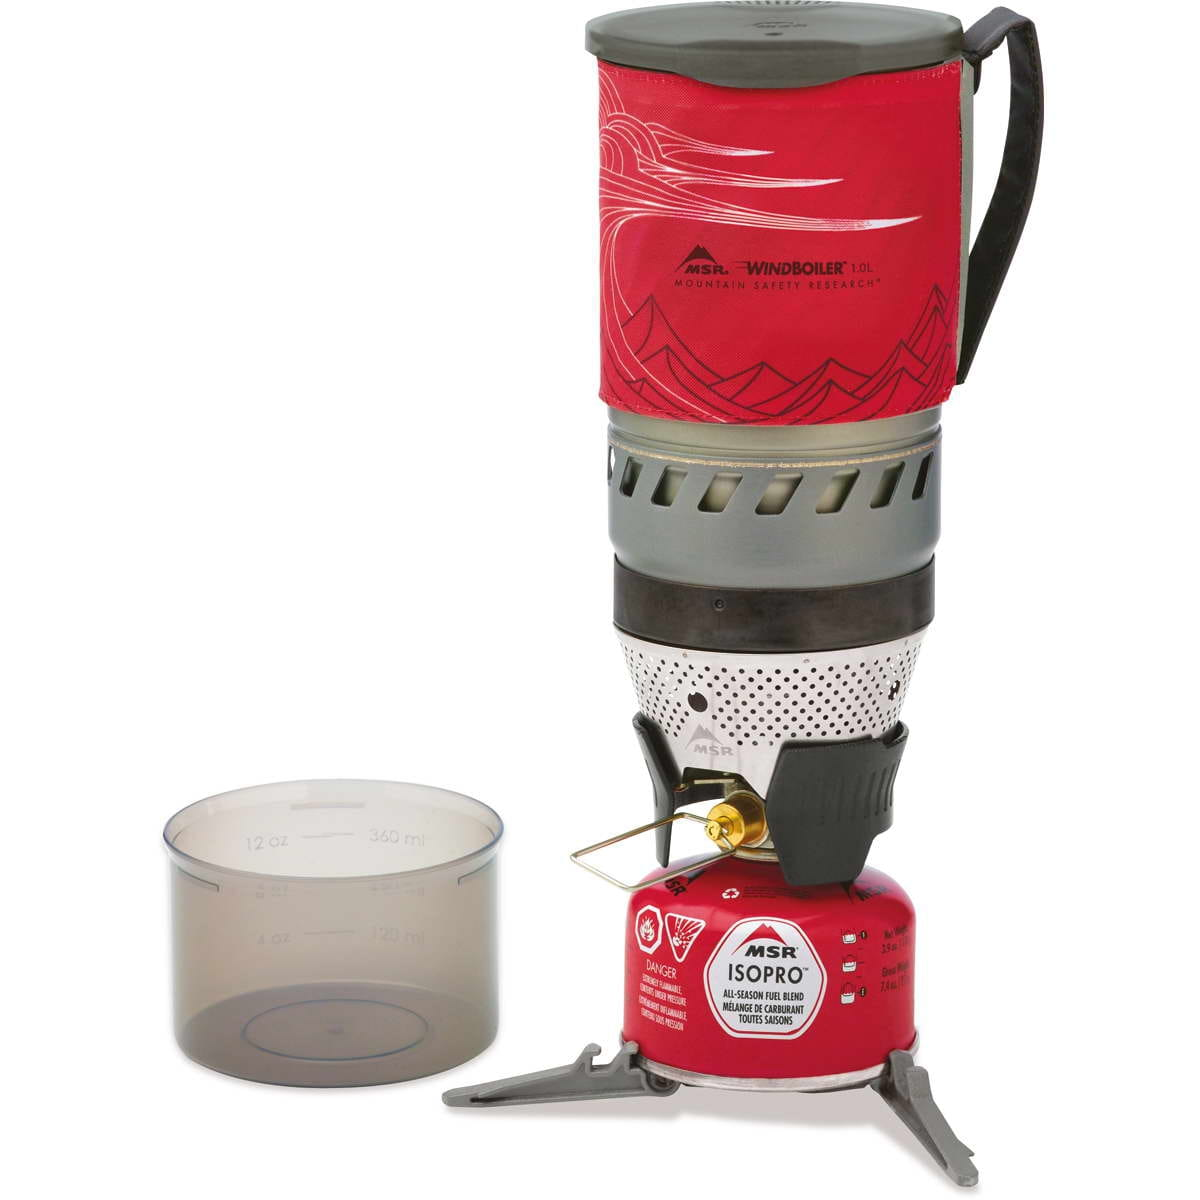 MSR WindBurner® - Kochersystem red - Bild 2